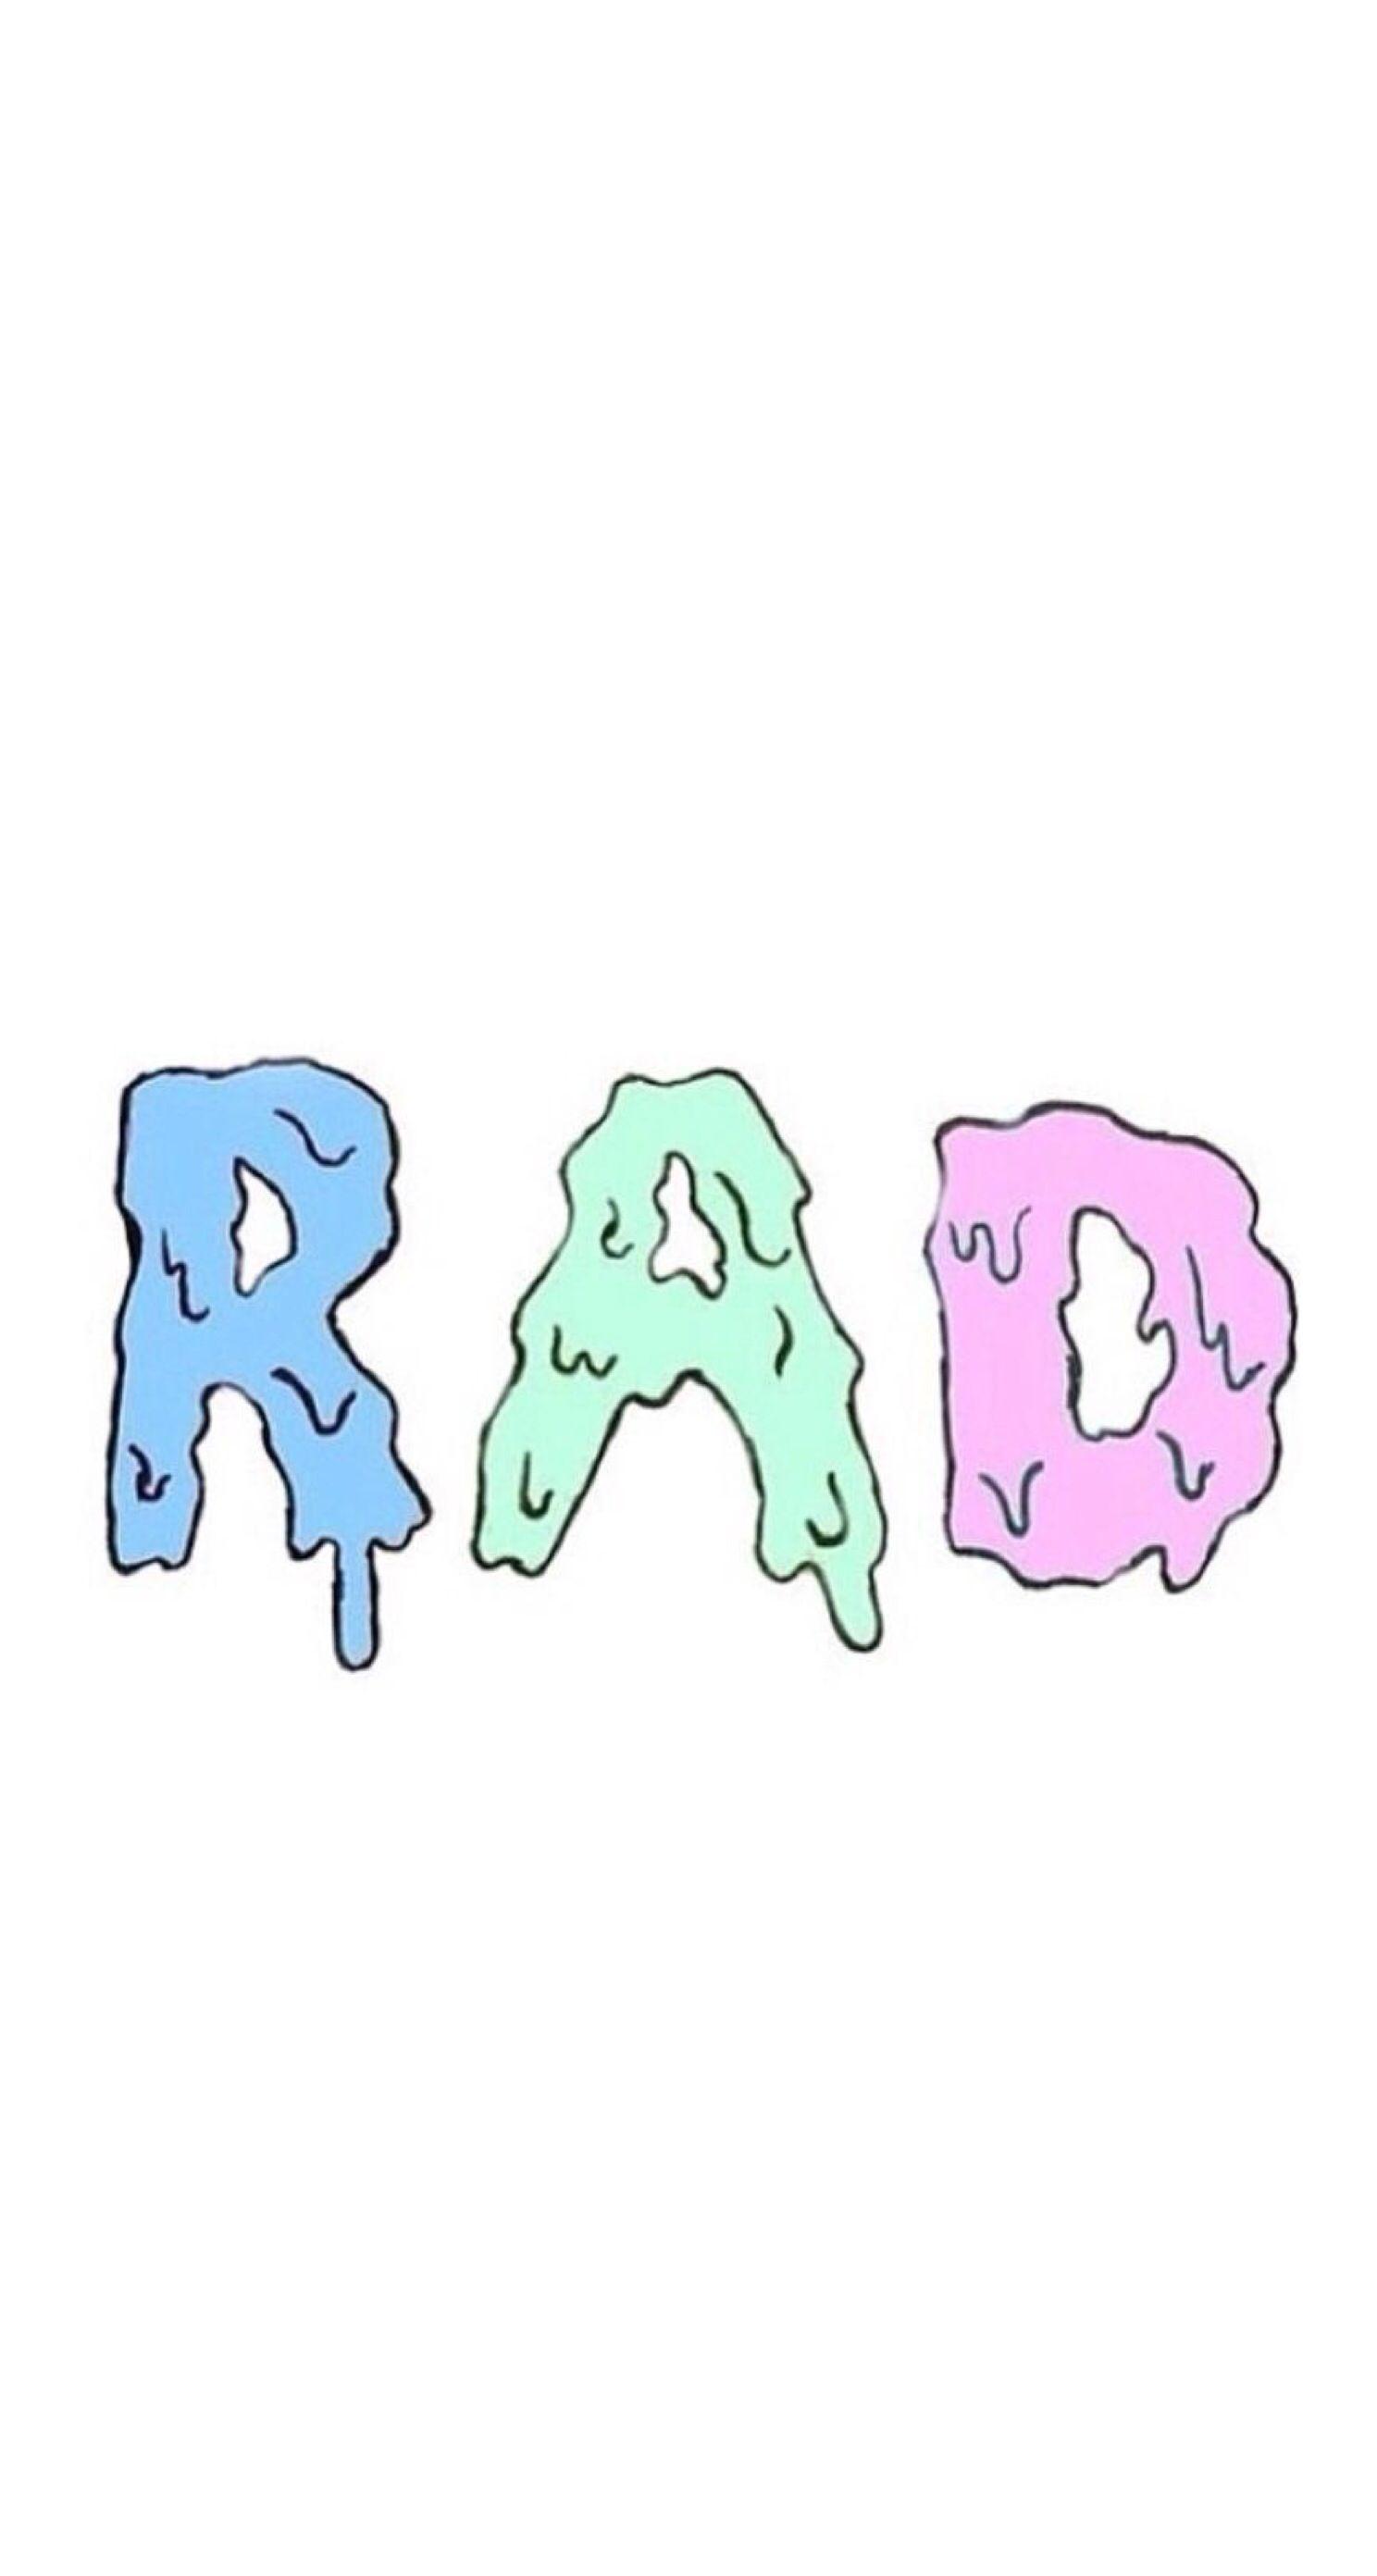 Rad tumblr overlay / transparent | Love This Sunday ...